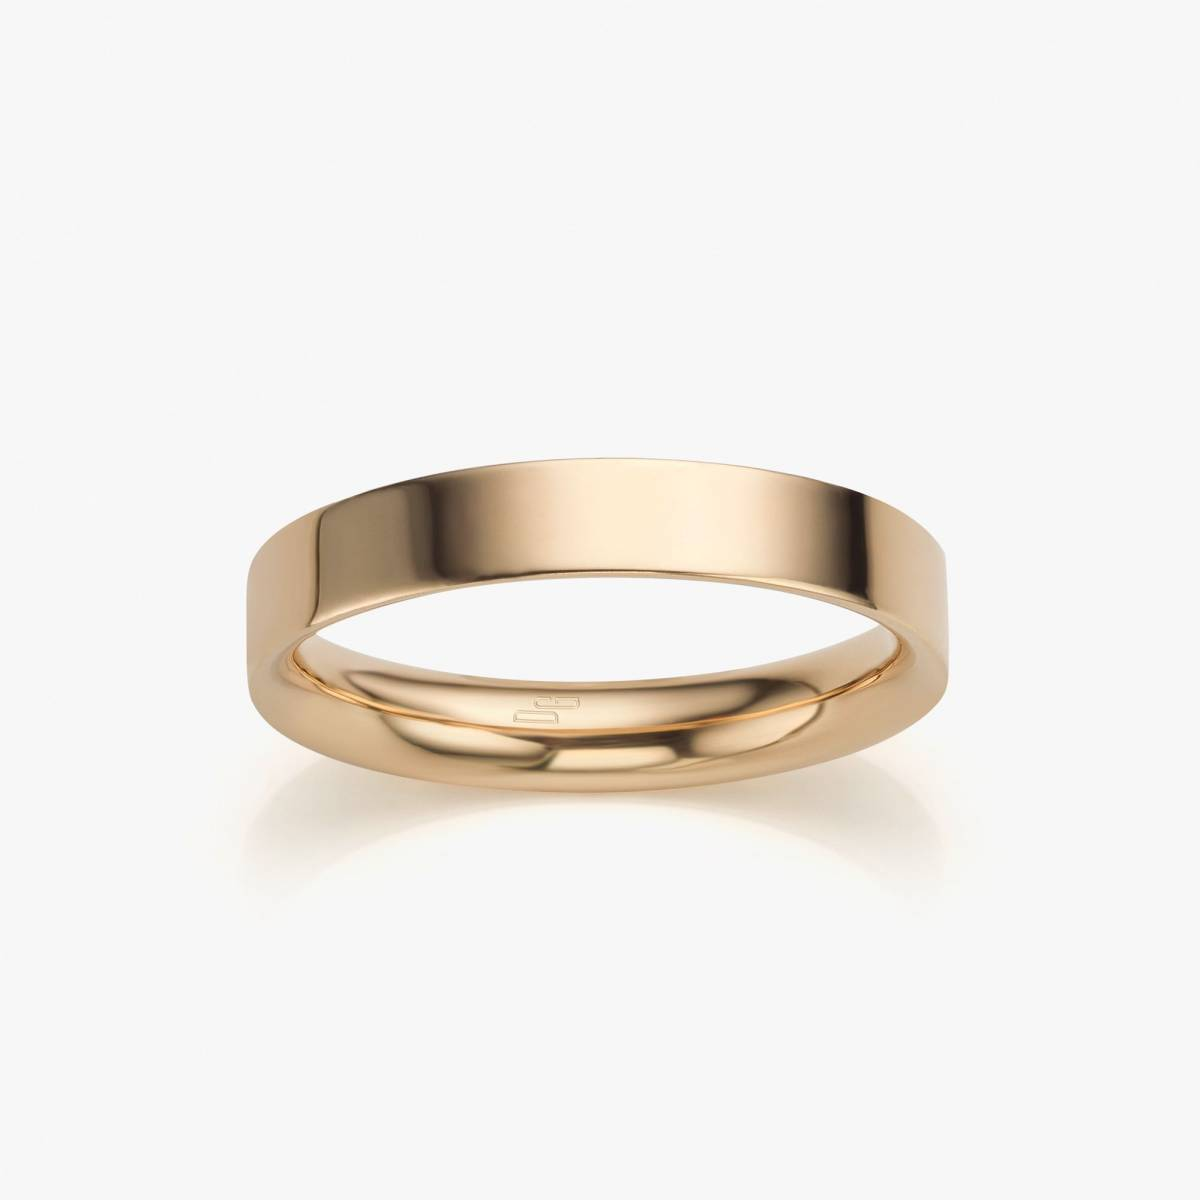 Maison De Greef - Juwelen - Brussel - Bruidsjuwelen - Trouwring - Verlovingsring - House of Weddings - 11